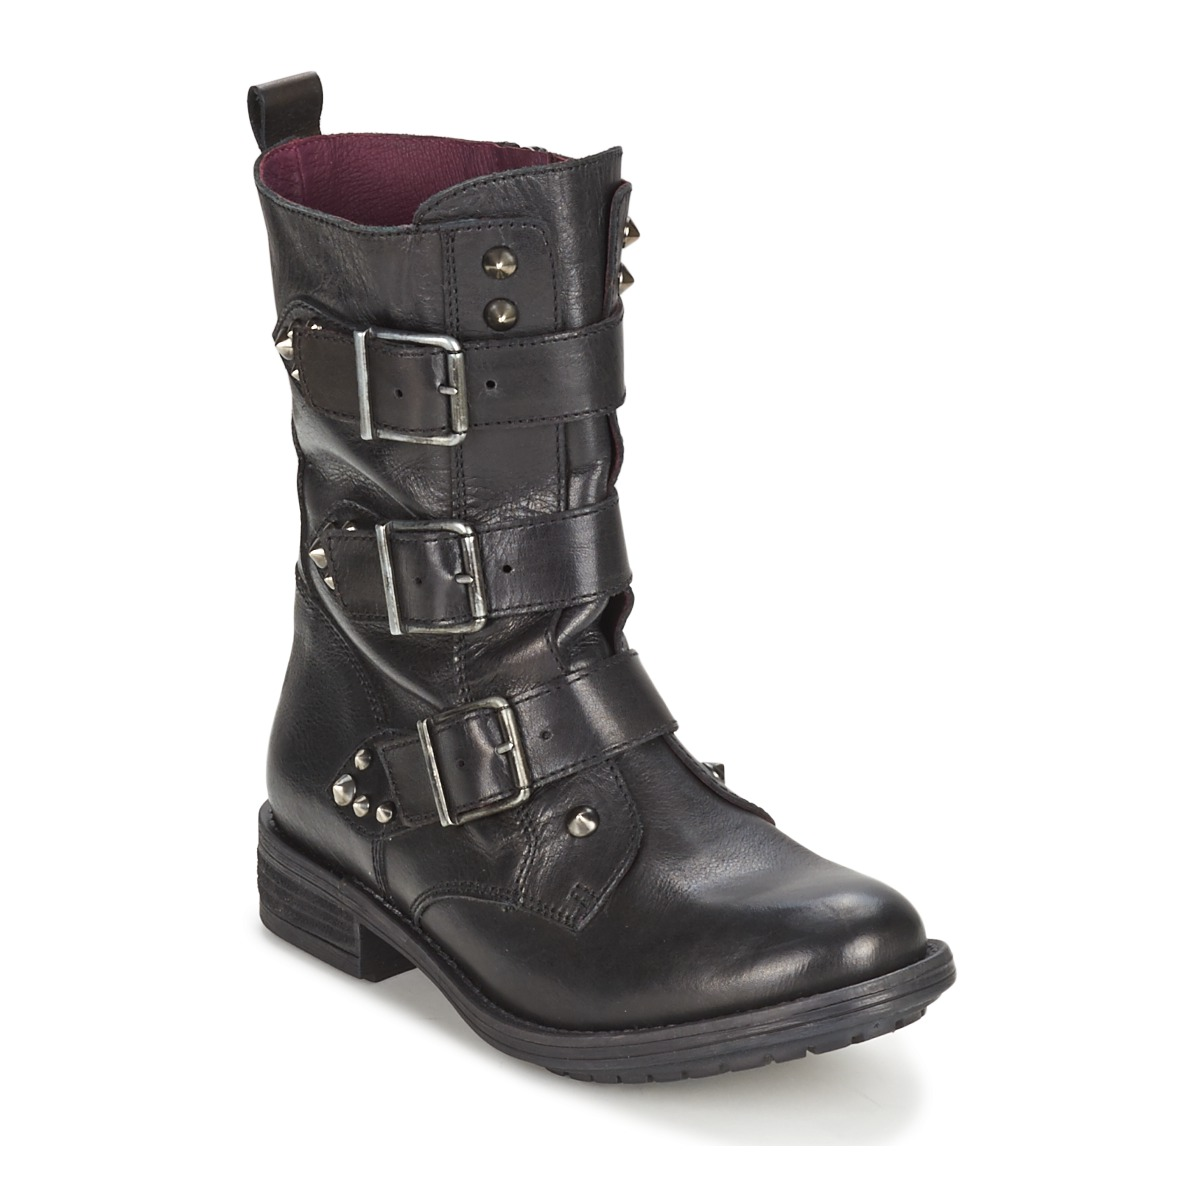 Ikks RANGER-COLLECTOR-BOUCLE Schwarz - Kostenloser Versand bei Spartoode ! - Schuhe Boots Damen 137,50 €